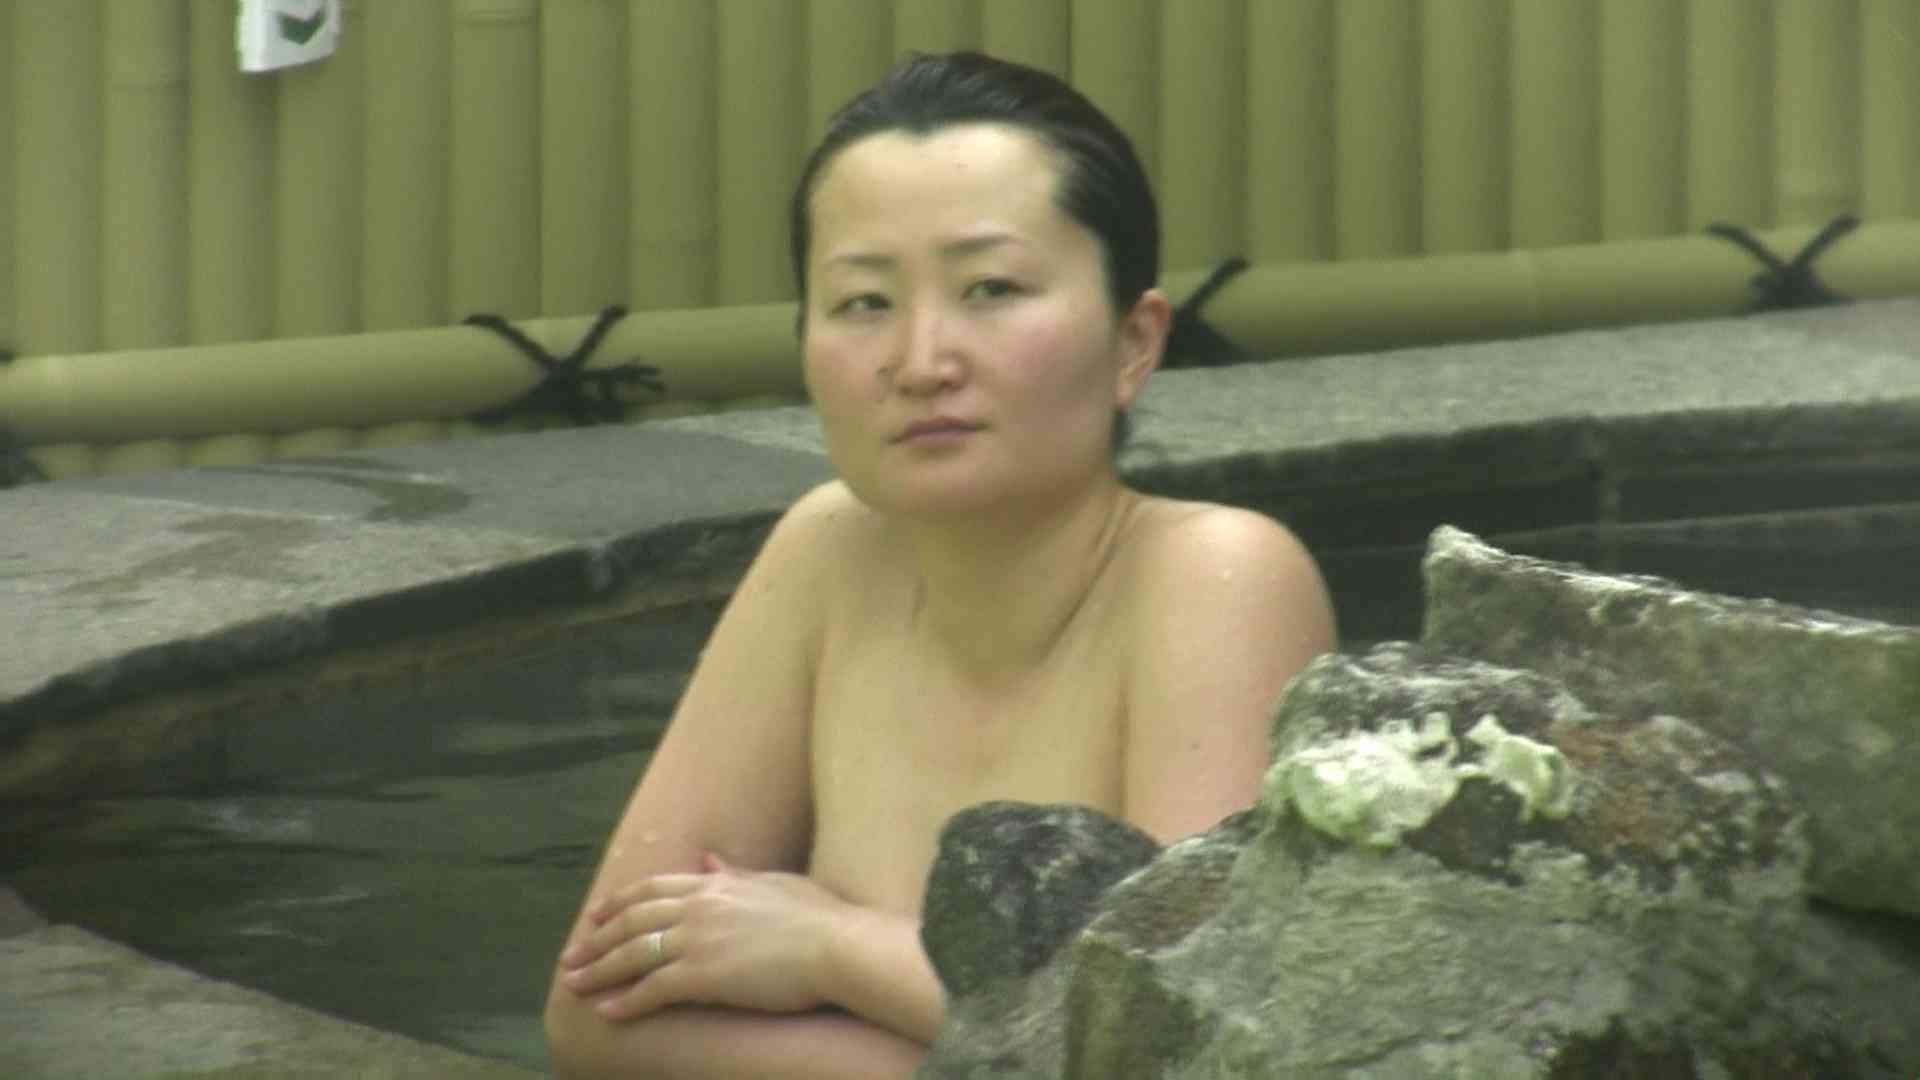 Aquaな露天風呂Vol.632 盗撮 | OLセックス  70画像 43